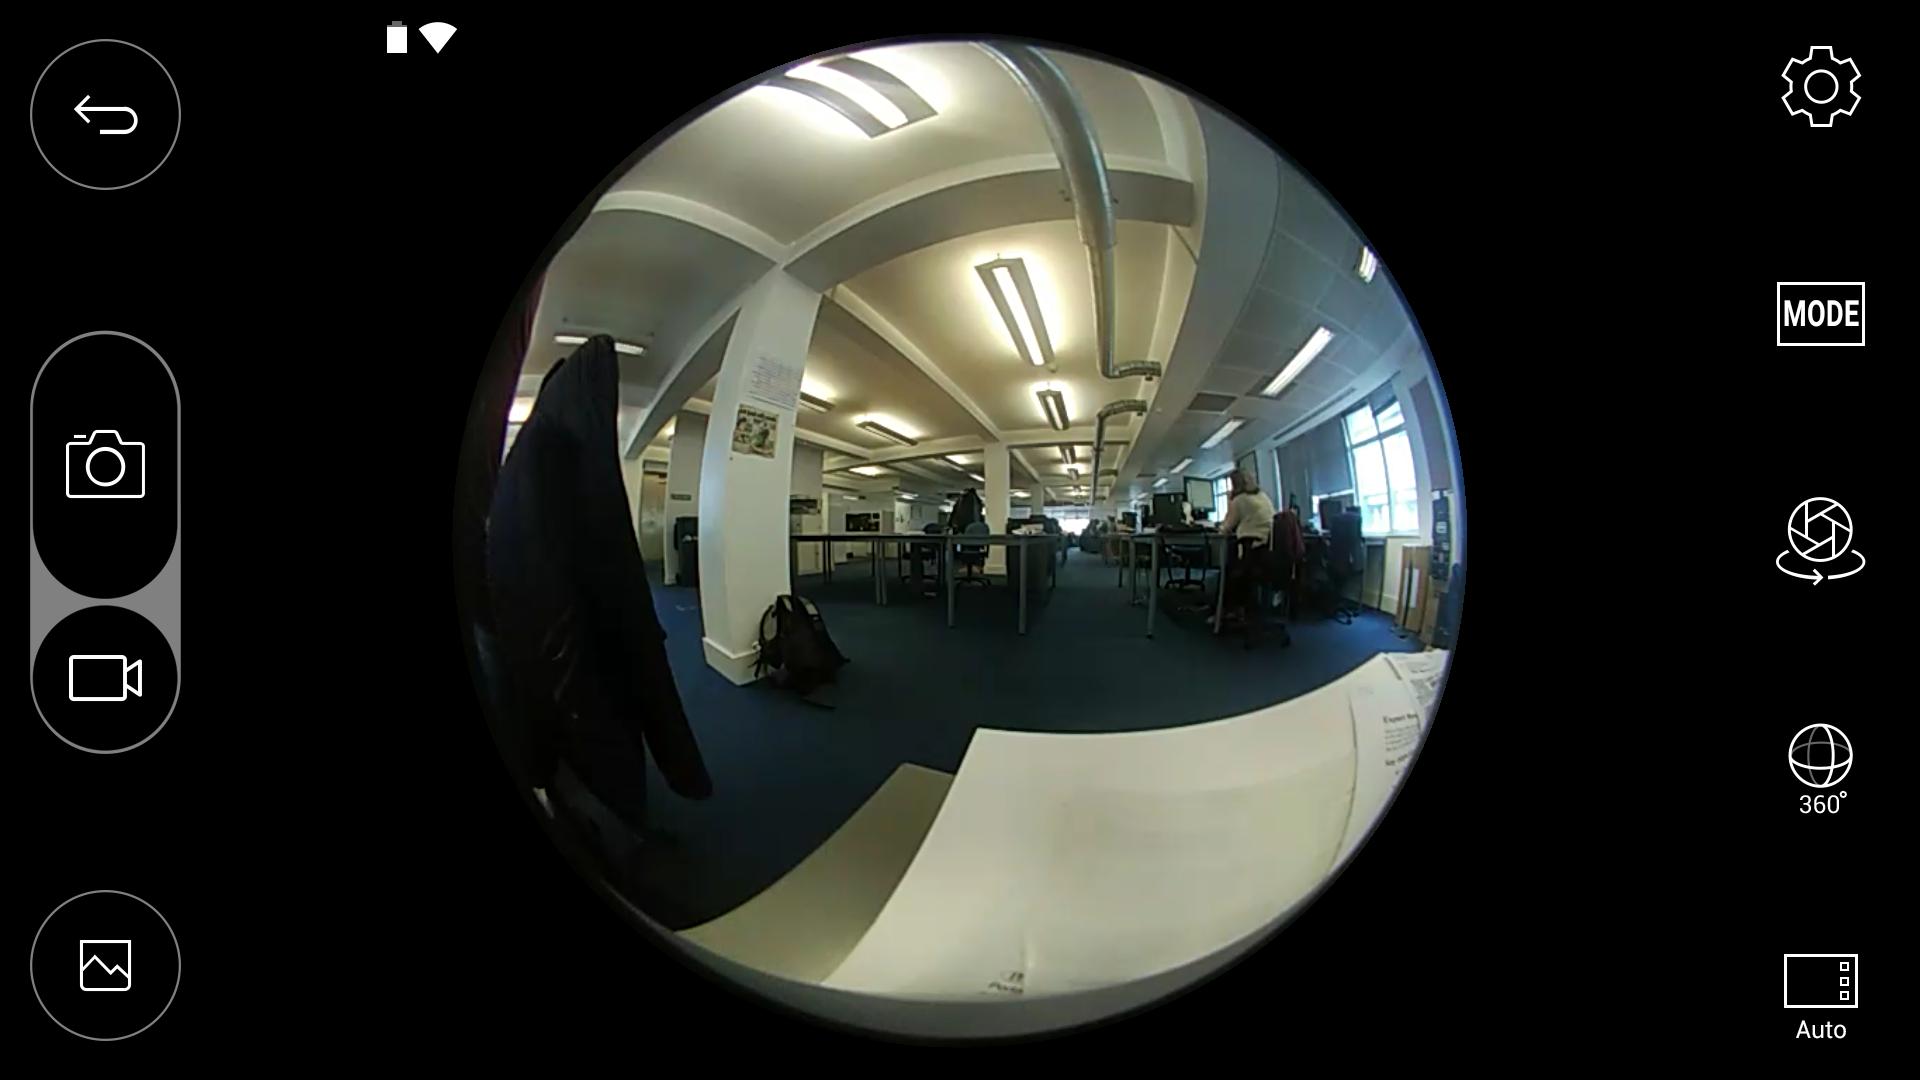 Video recording, Photo via .expertreviews.co.uk